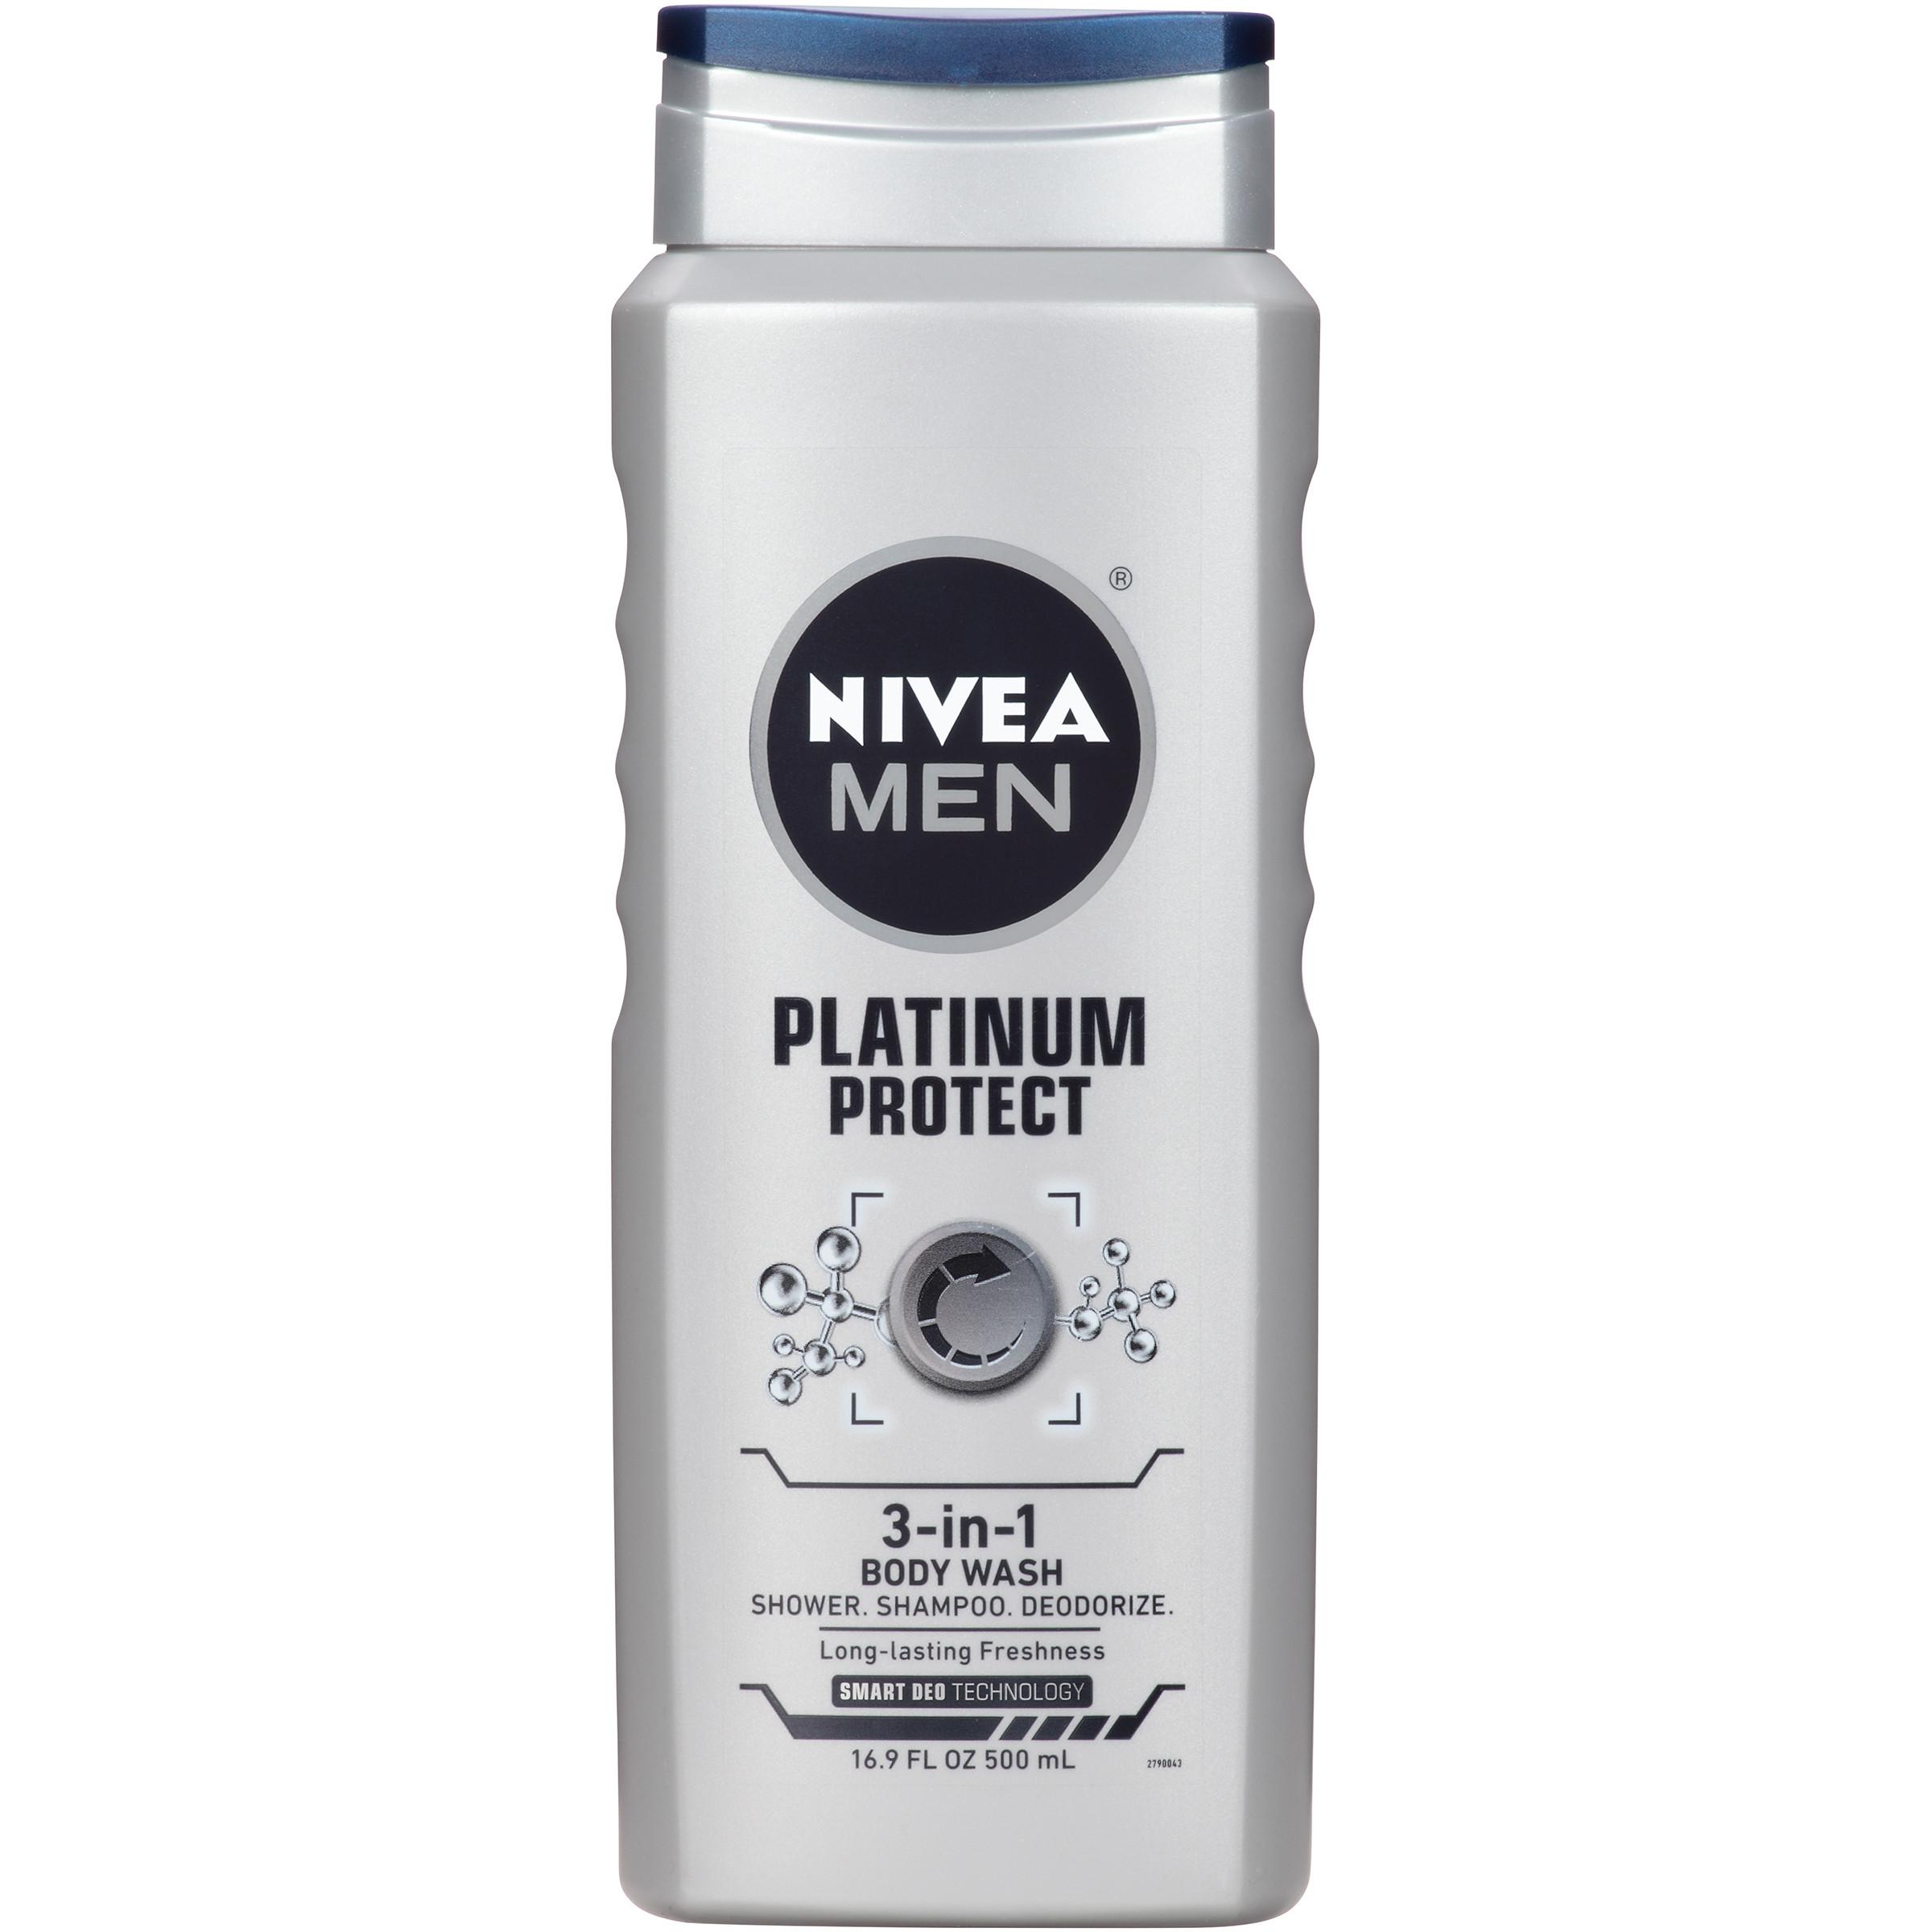 Nivea Men Platinum Protect 3-in-1 Deodorizing Body Wash,16.9 oz - Walmart.com